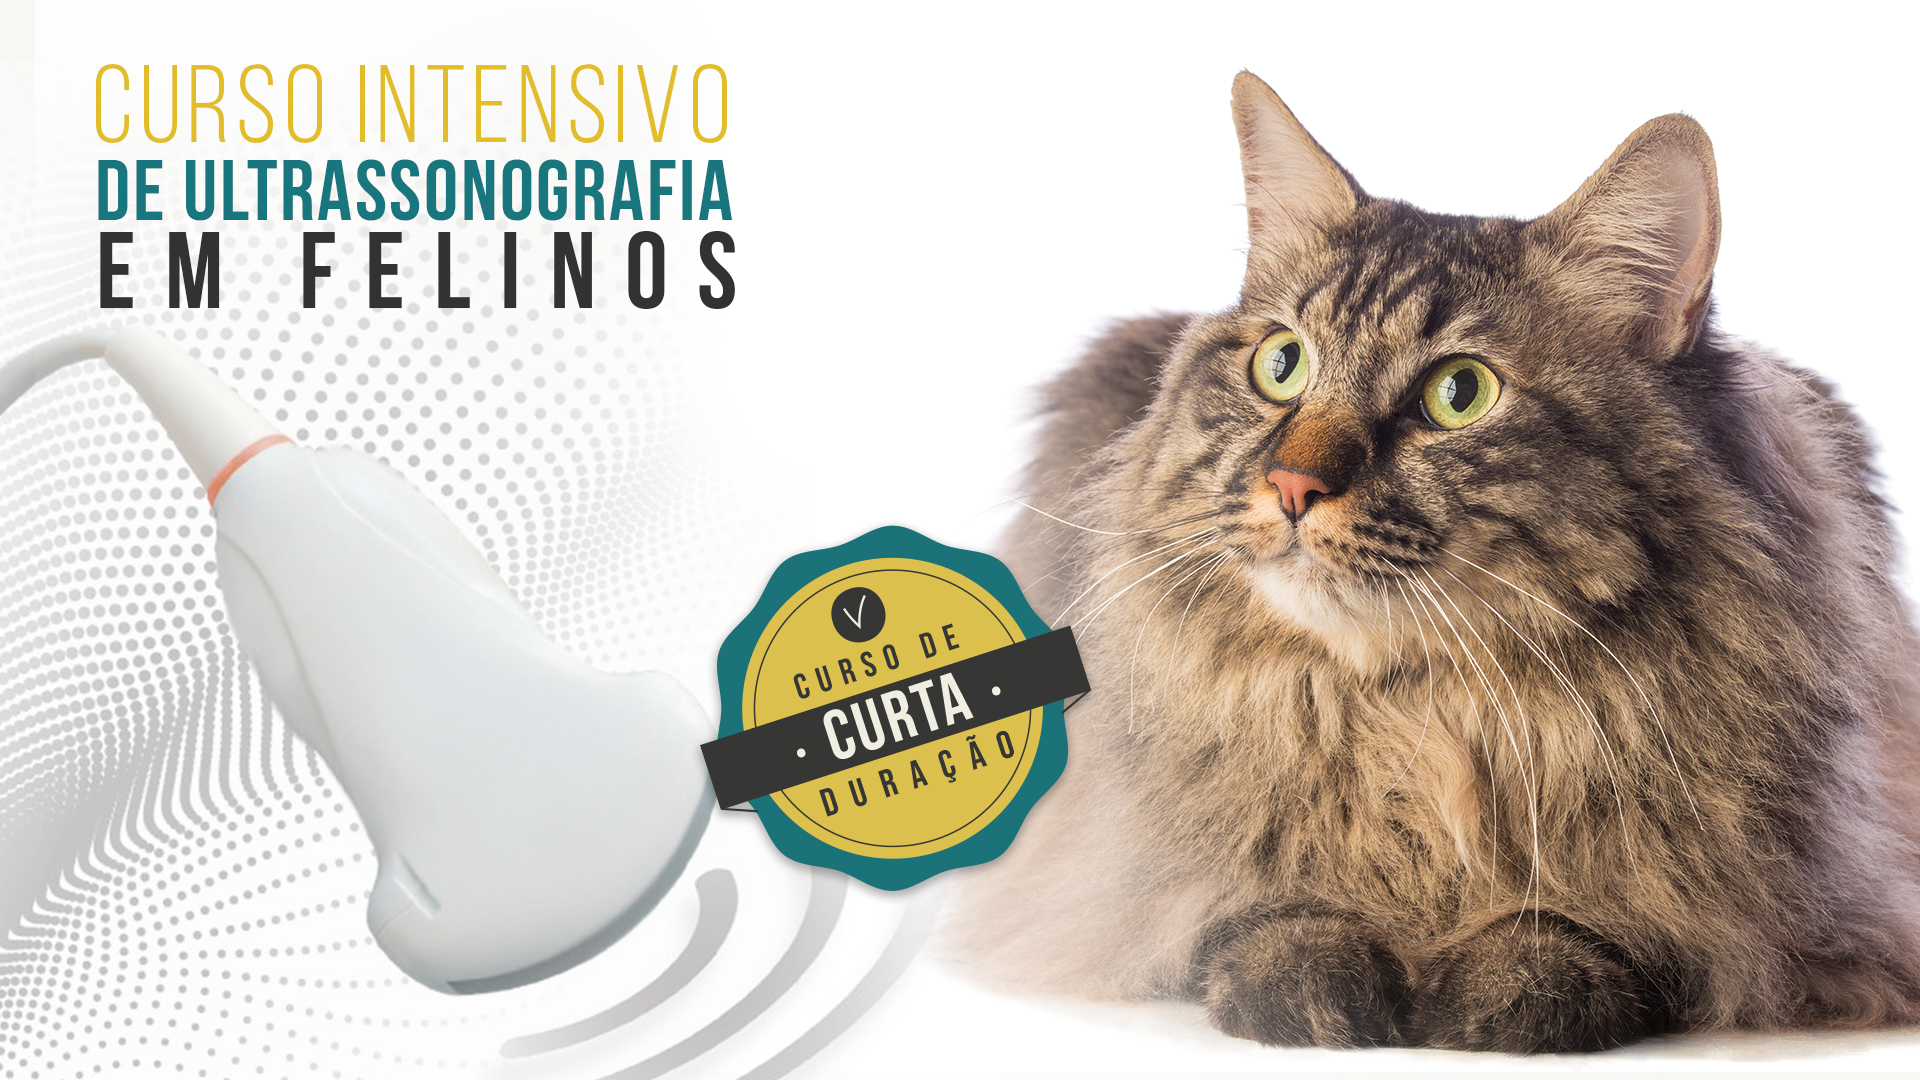 Curso Intensivo de Ultrassonografia Abdominal em Felinos